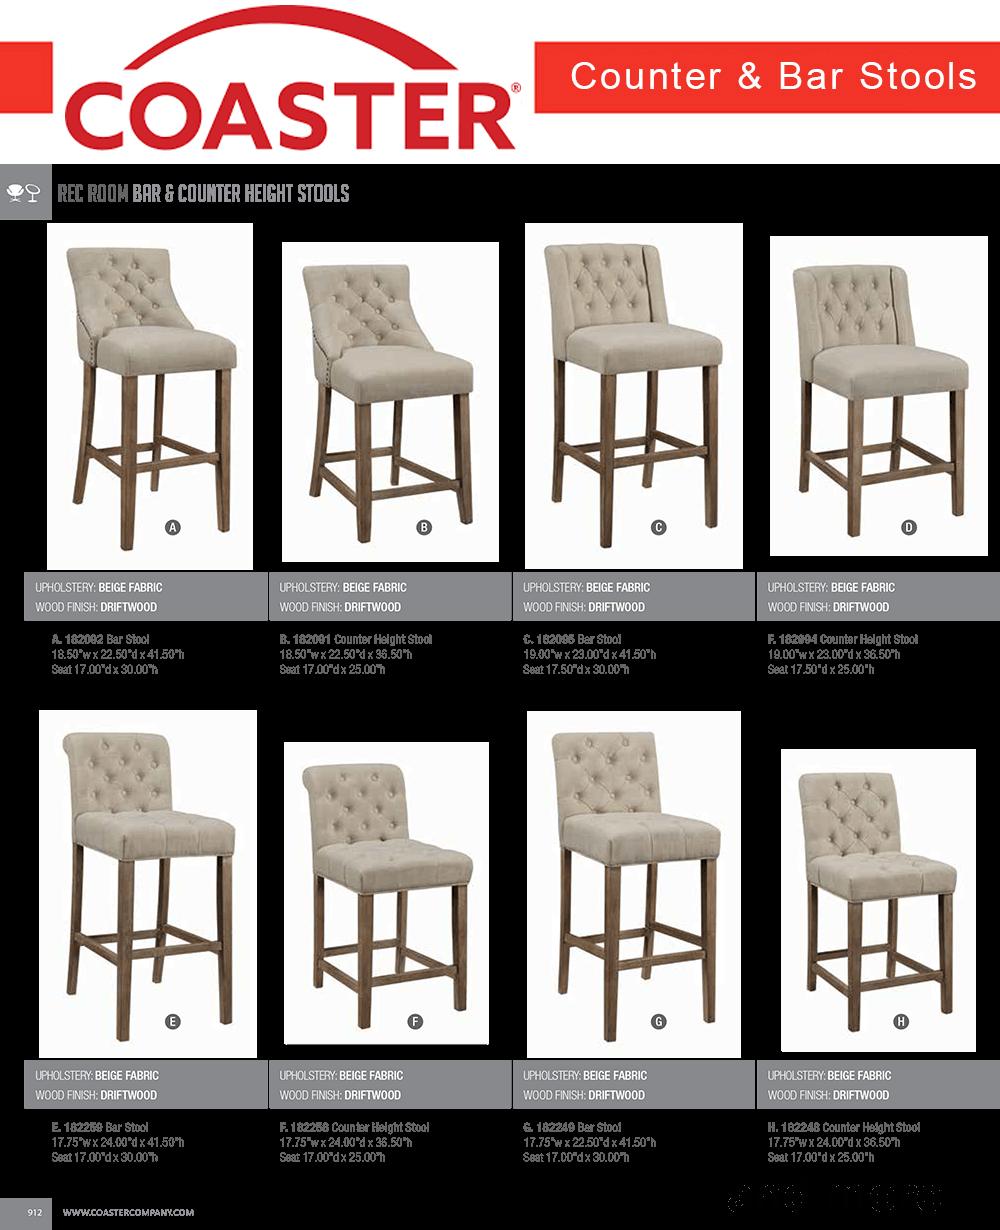 Stupendous Stools Cabinetpro Beatyapartments Chair Design Images Beatyapartmentscom